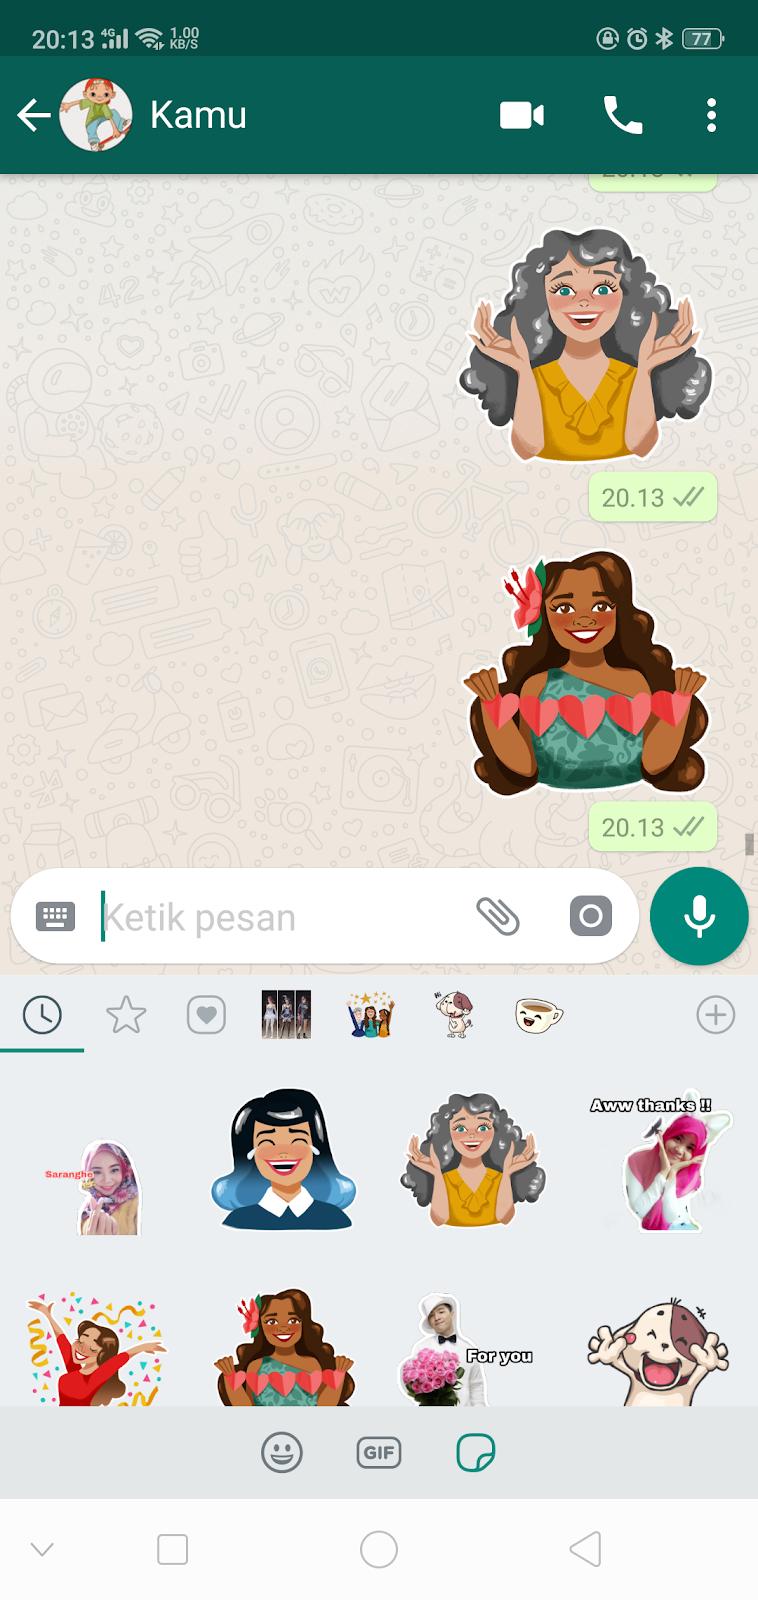 Cara Mudah Membuat Stiker Whatsapp Terbaru Komputer Kosan